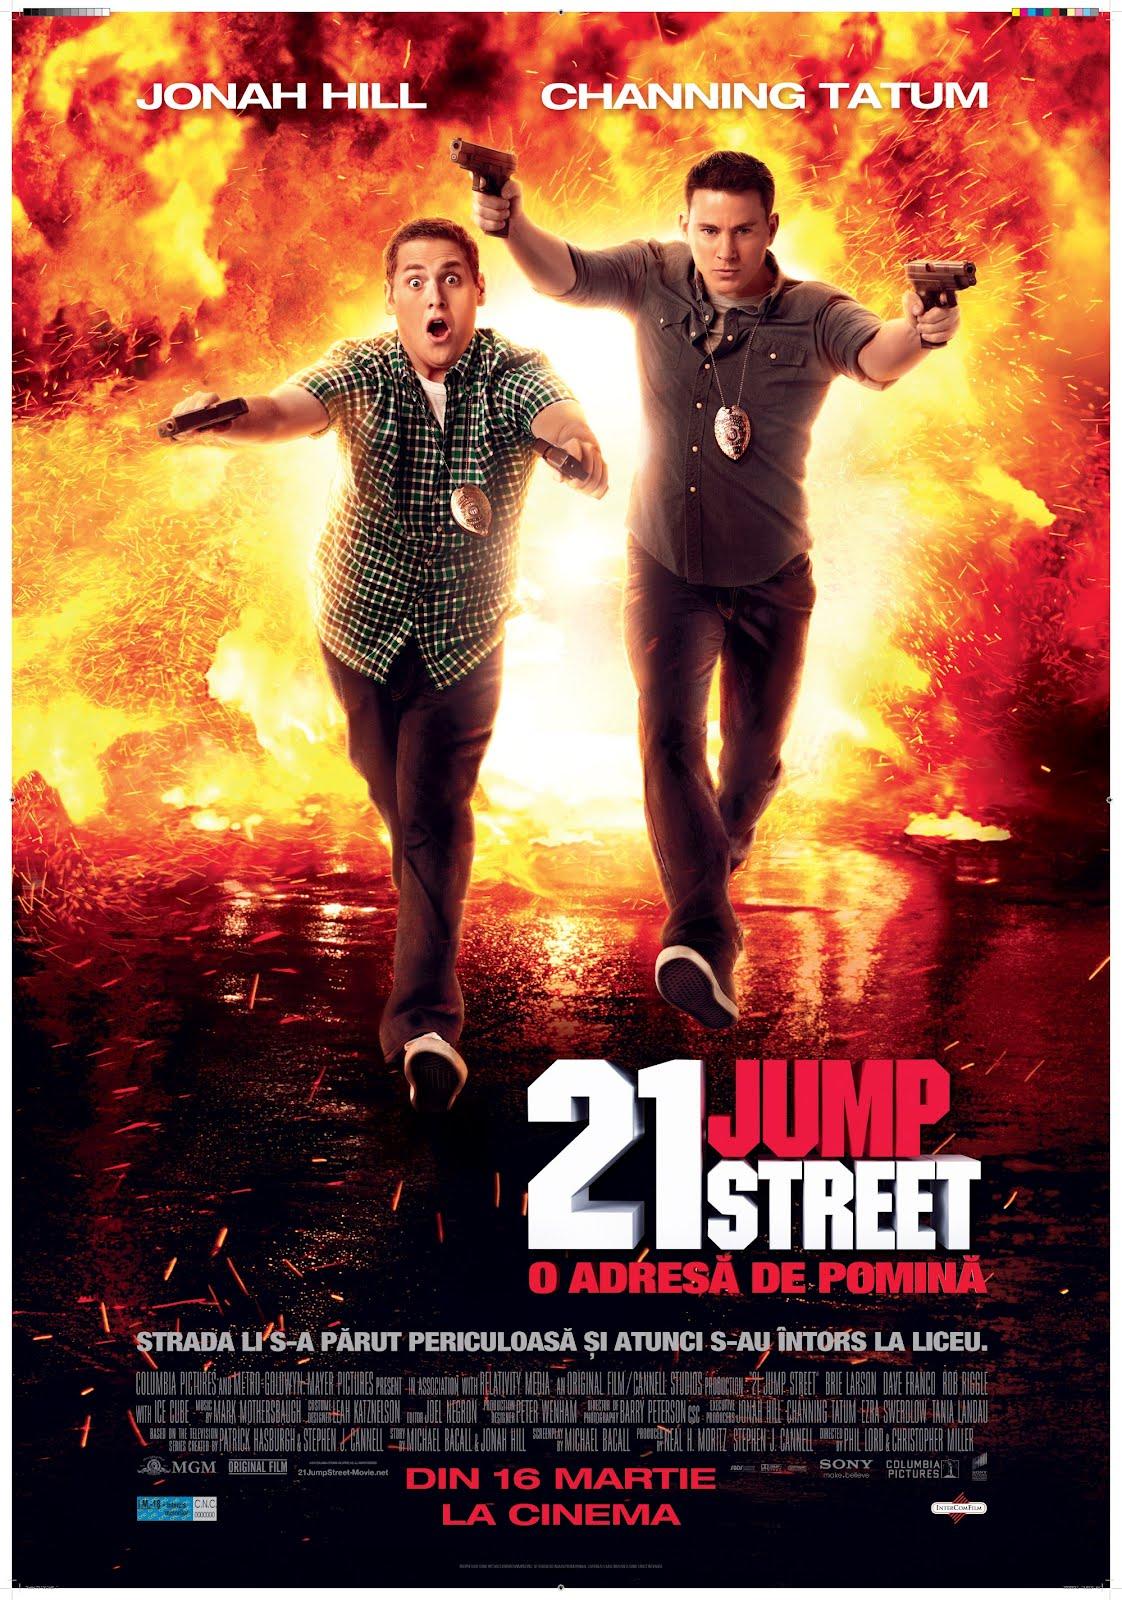 21 jump street online subtitrat in romana gratis hd